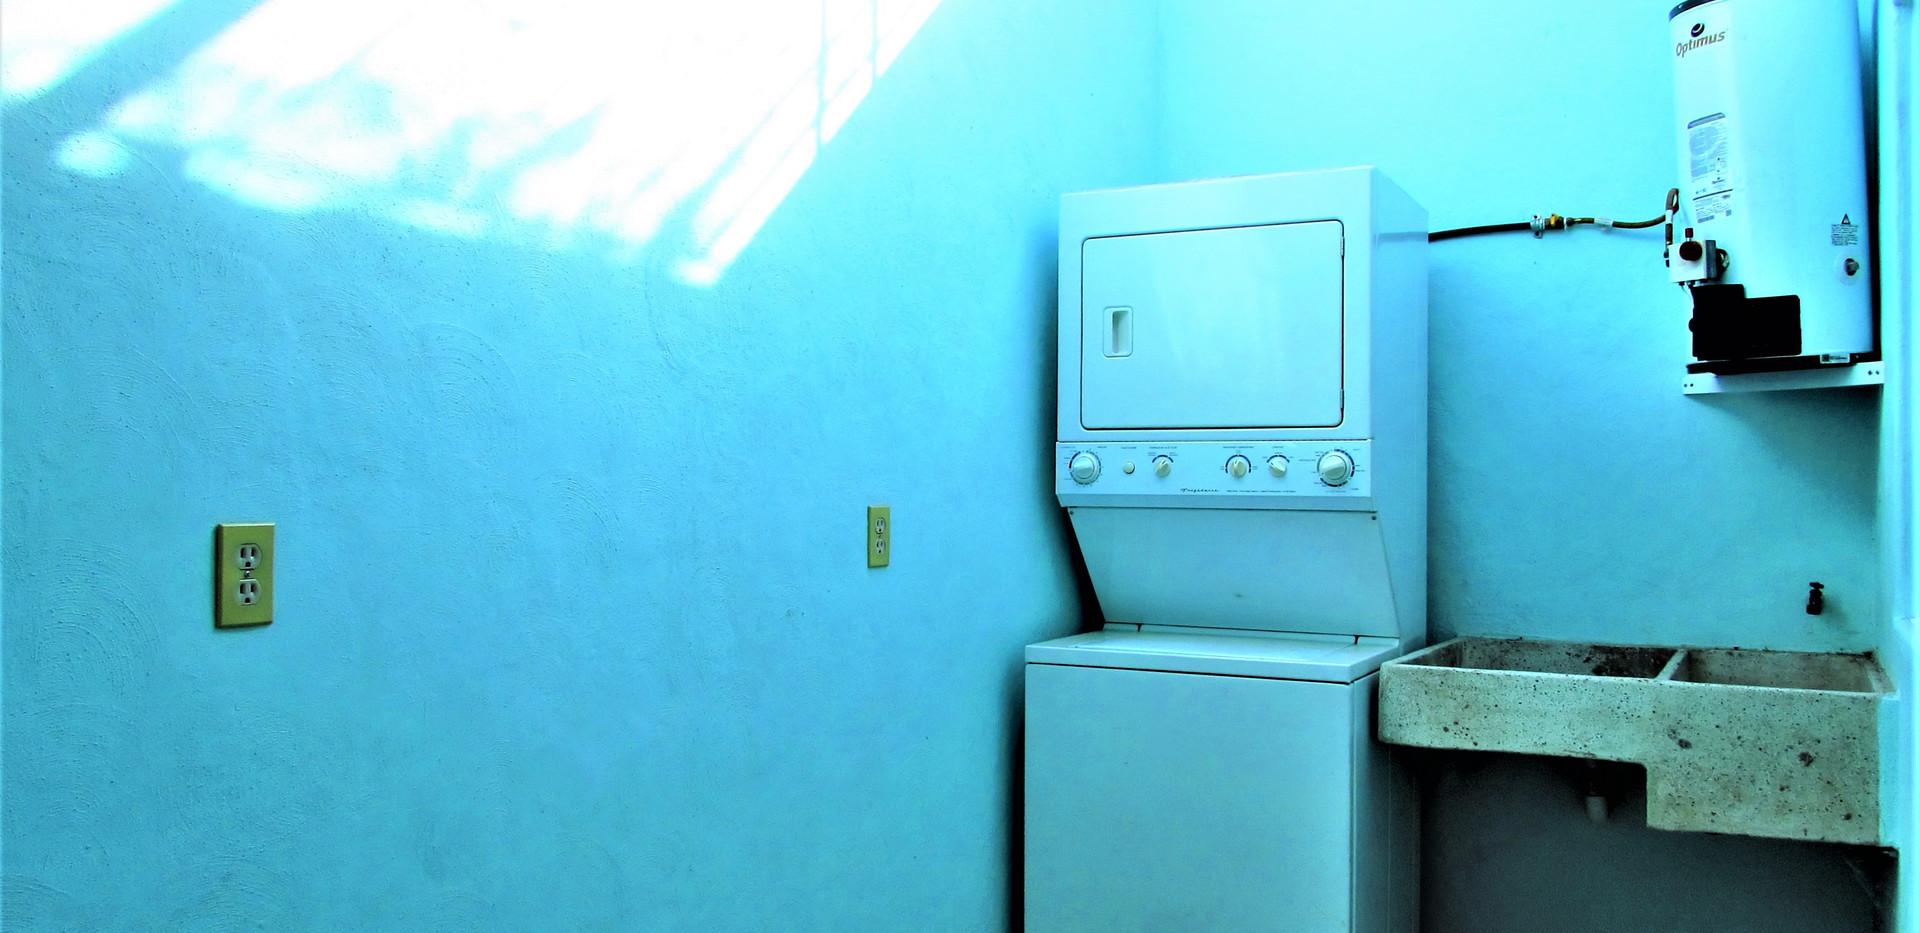 Cornejo's- Laundry room